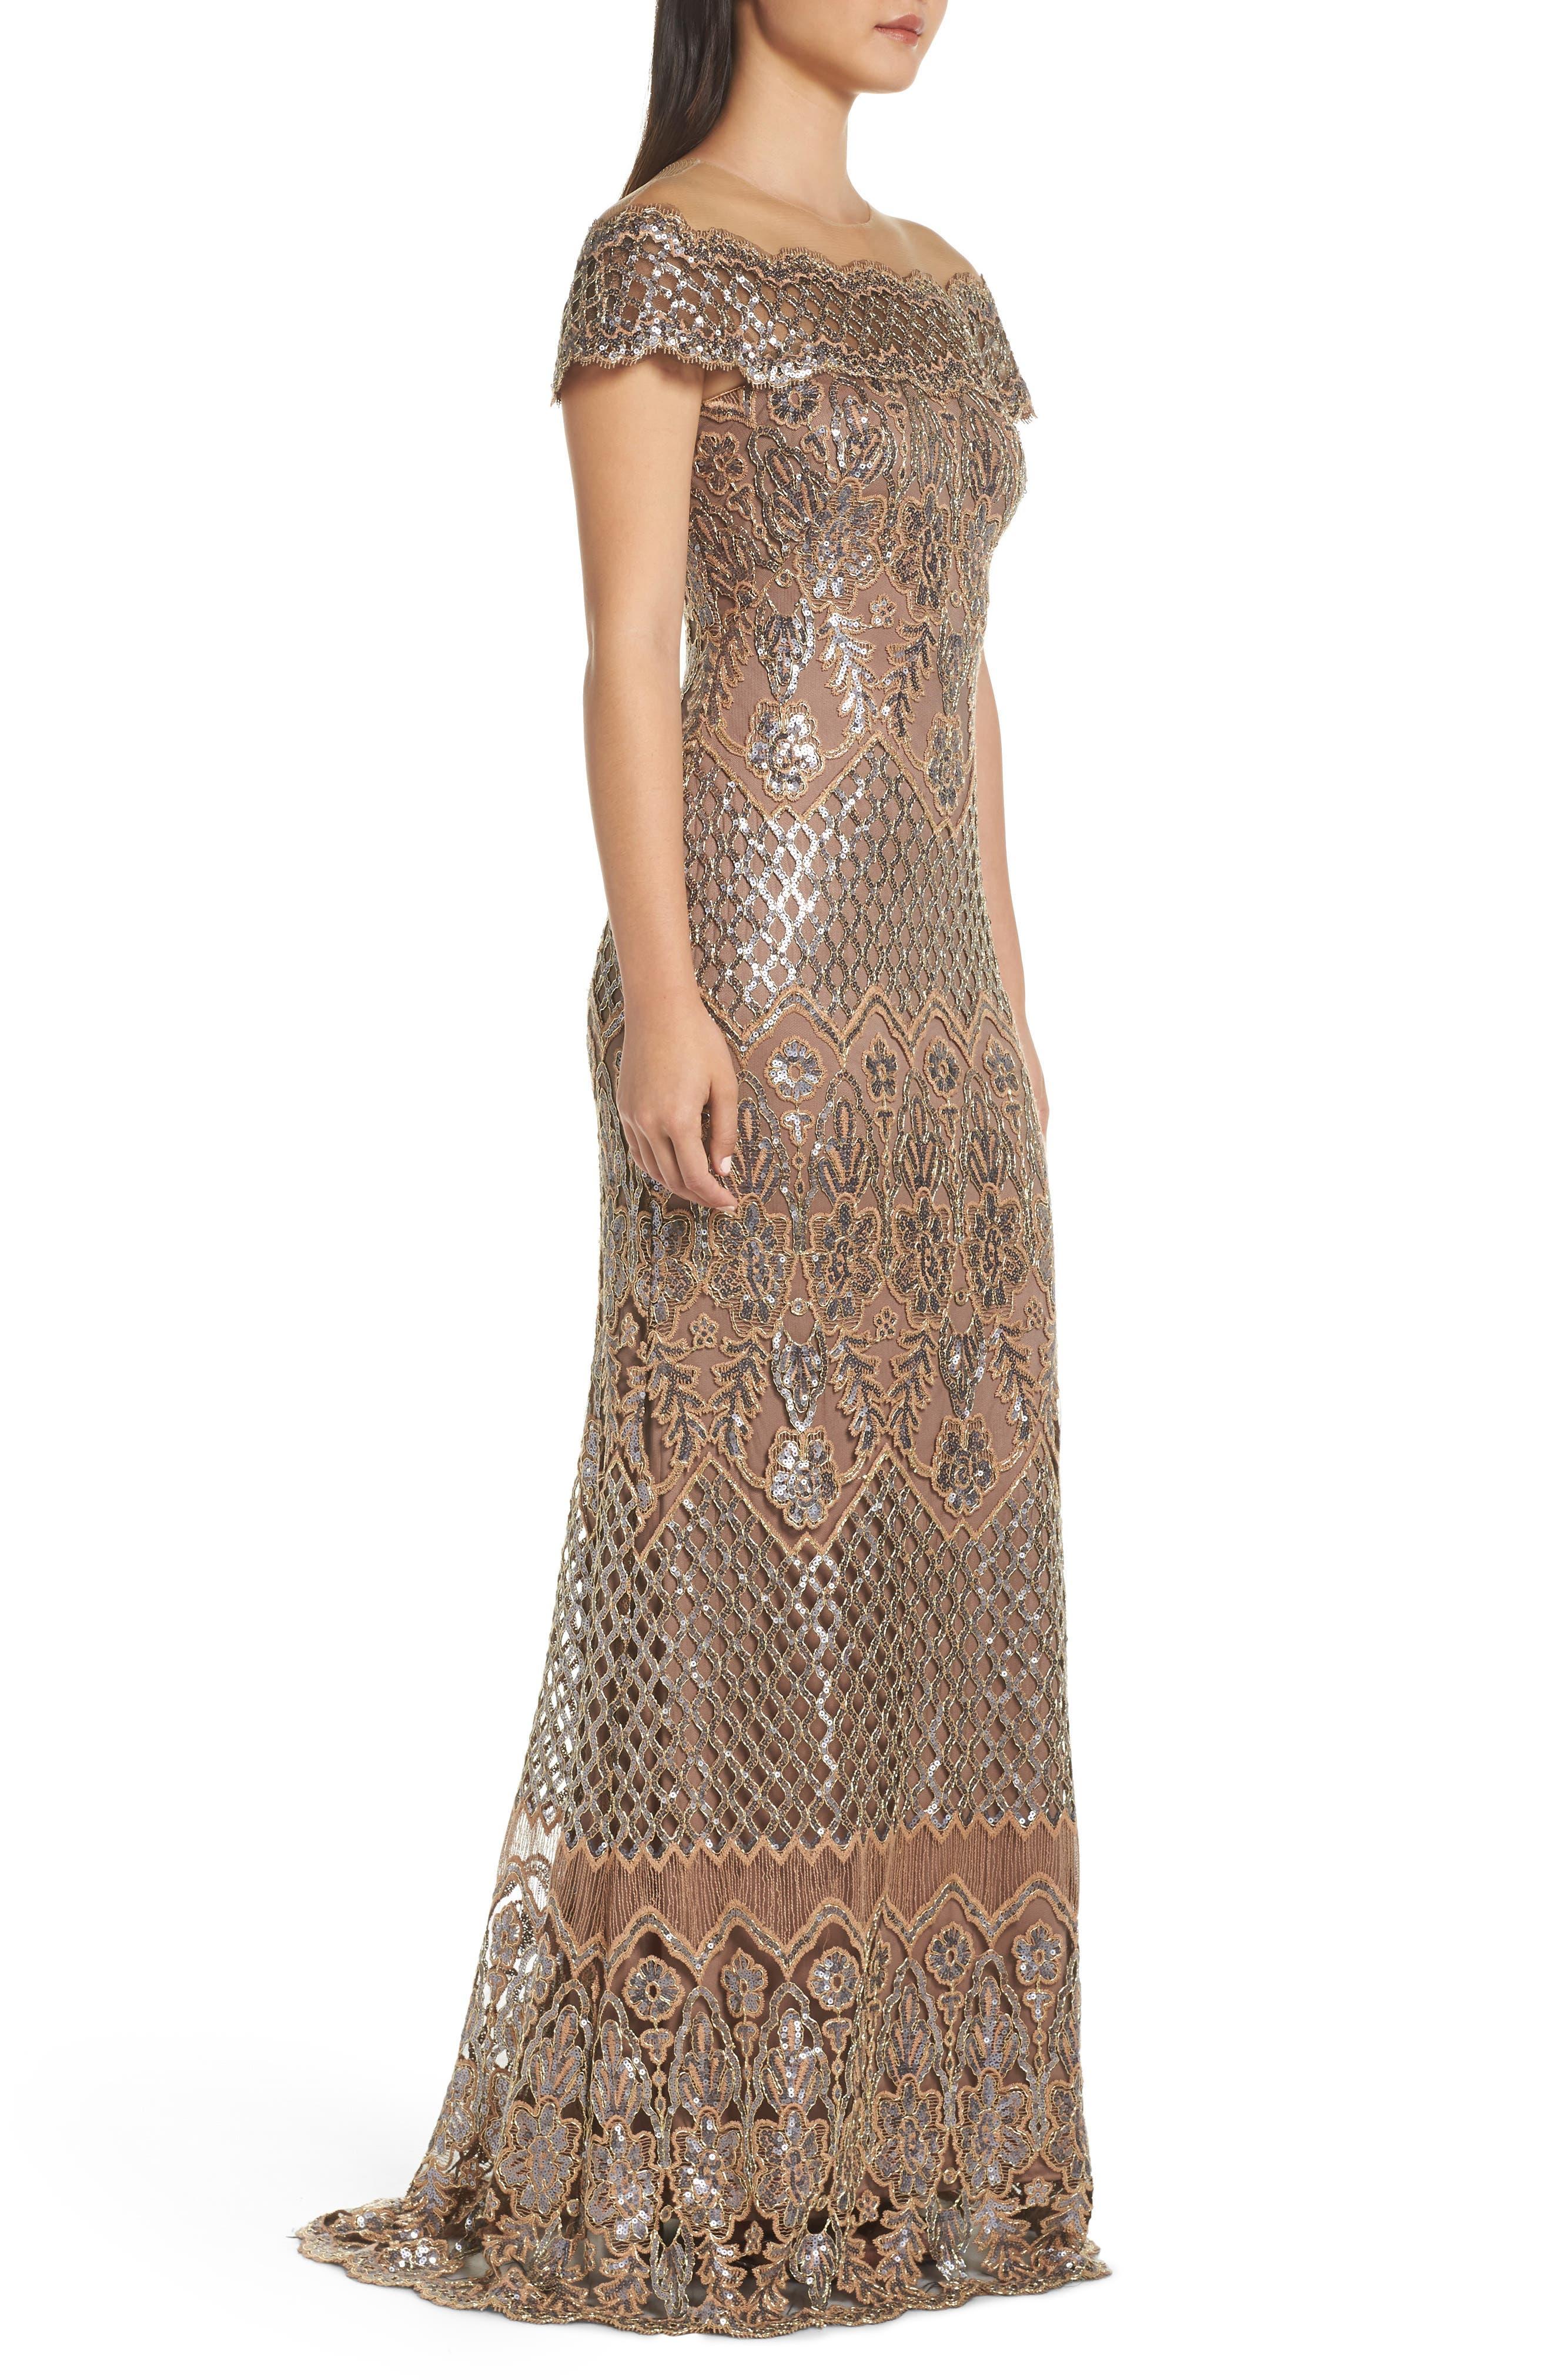 TADASHI SHOJI, Illusion Neck Sequin Lace Evening Dress, Alternate thumbnail 4, color, 230